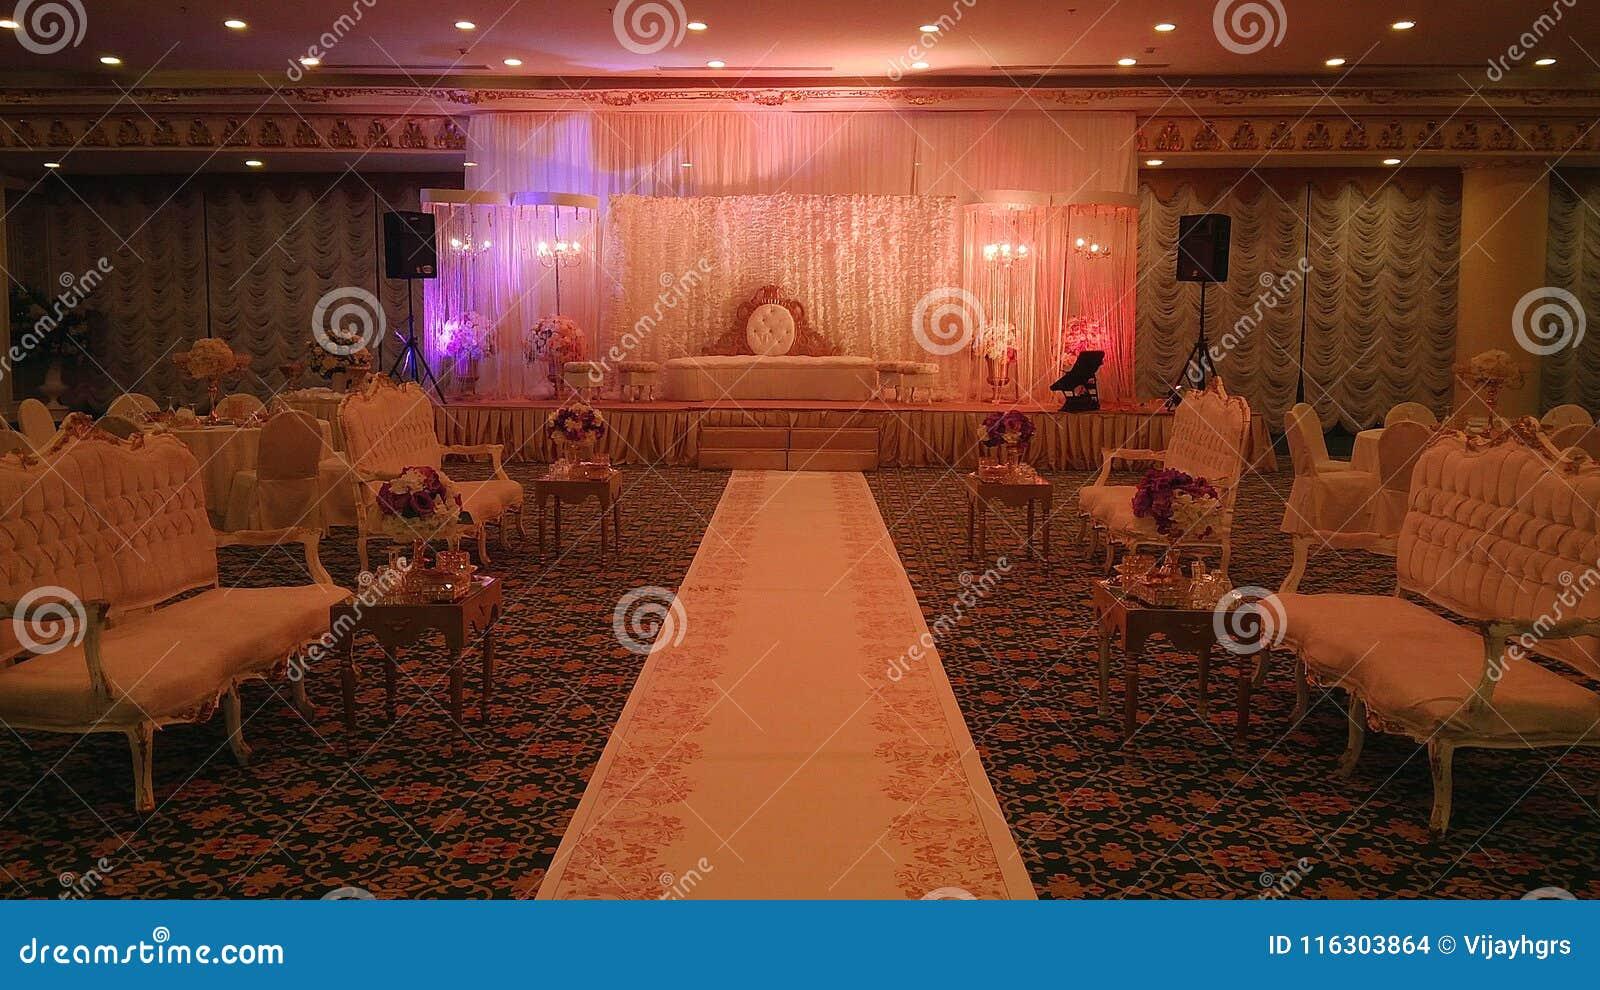 Elegant Banquet Hall Wedding Decorations Stock Photo Image